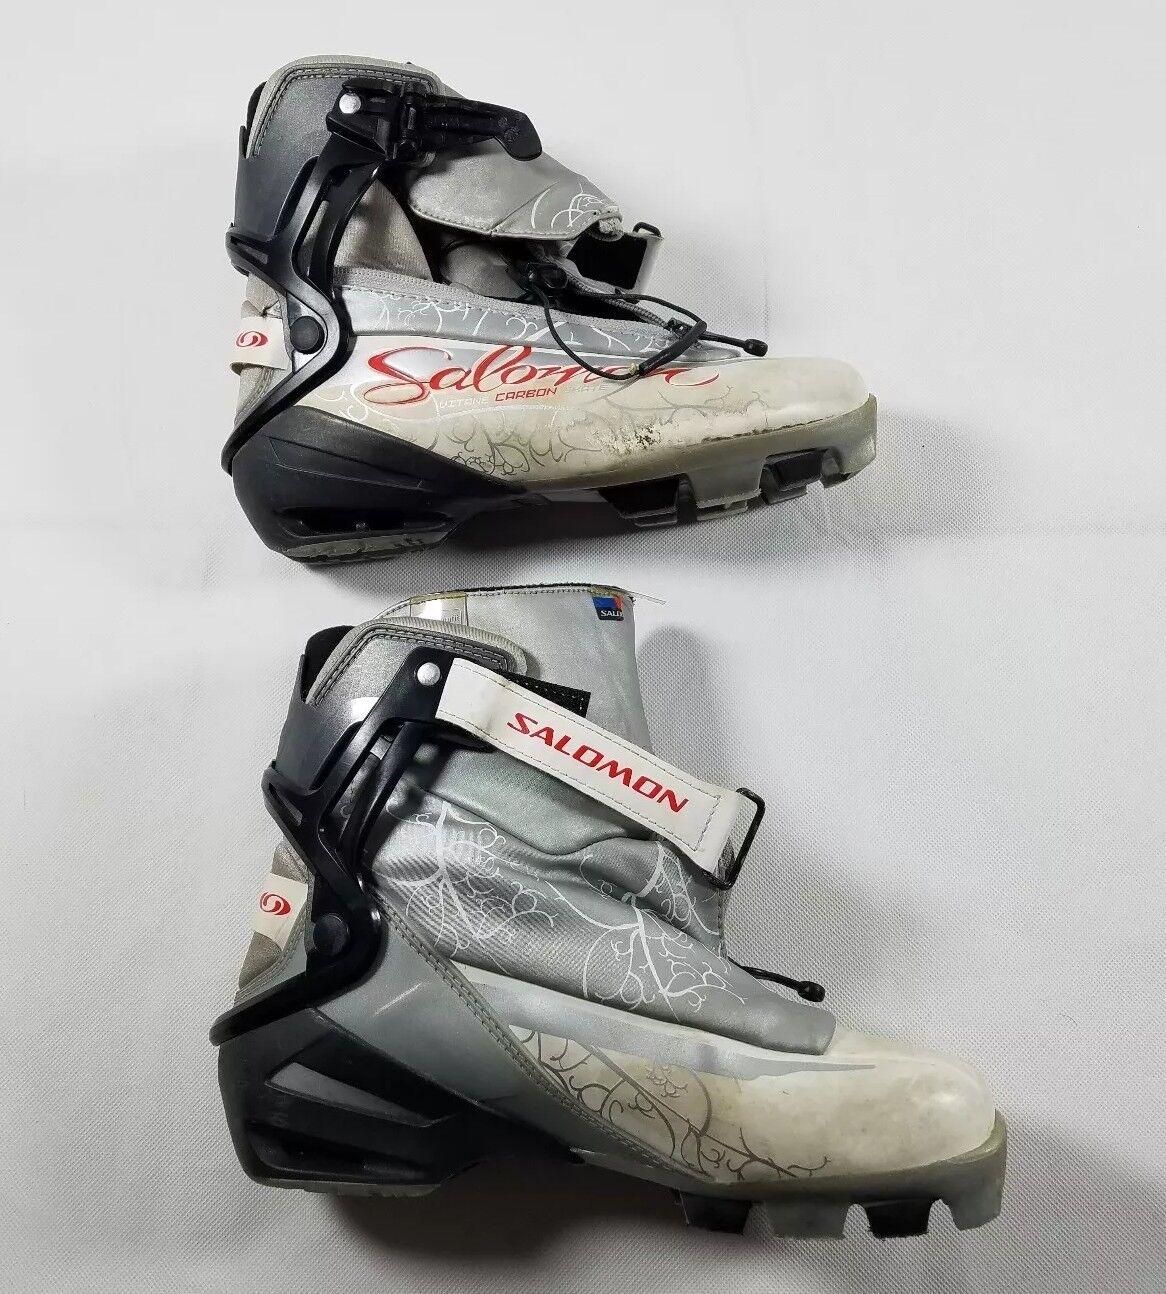 Salomon Womens Vitane Carbon S  Cross  Country Ski Boots Size 6  free shipping worldwide